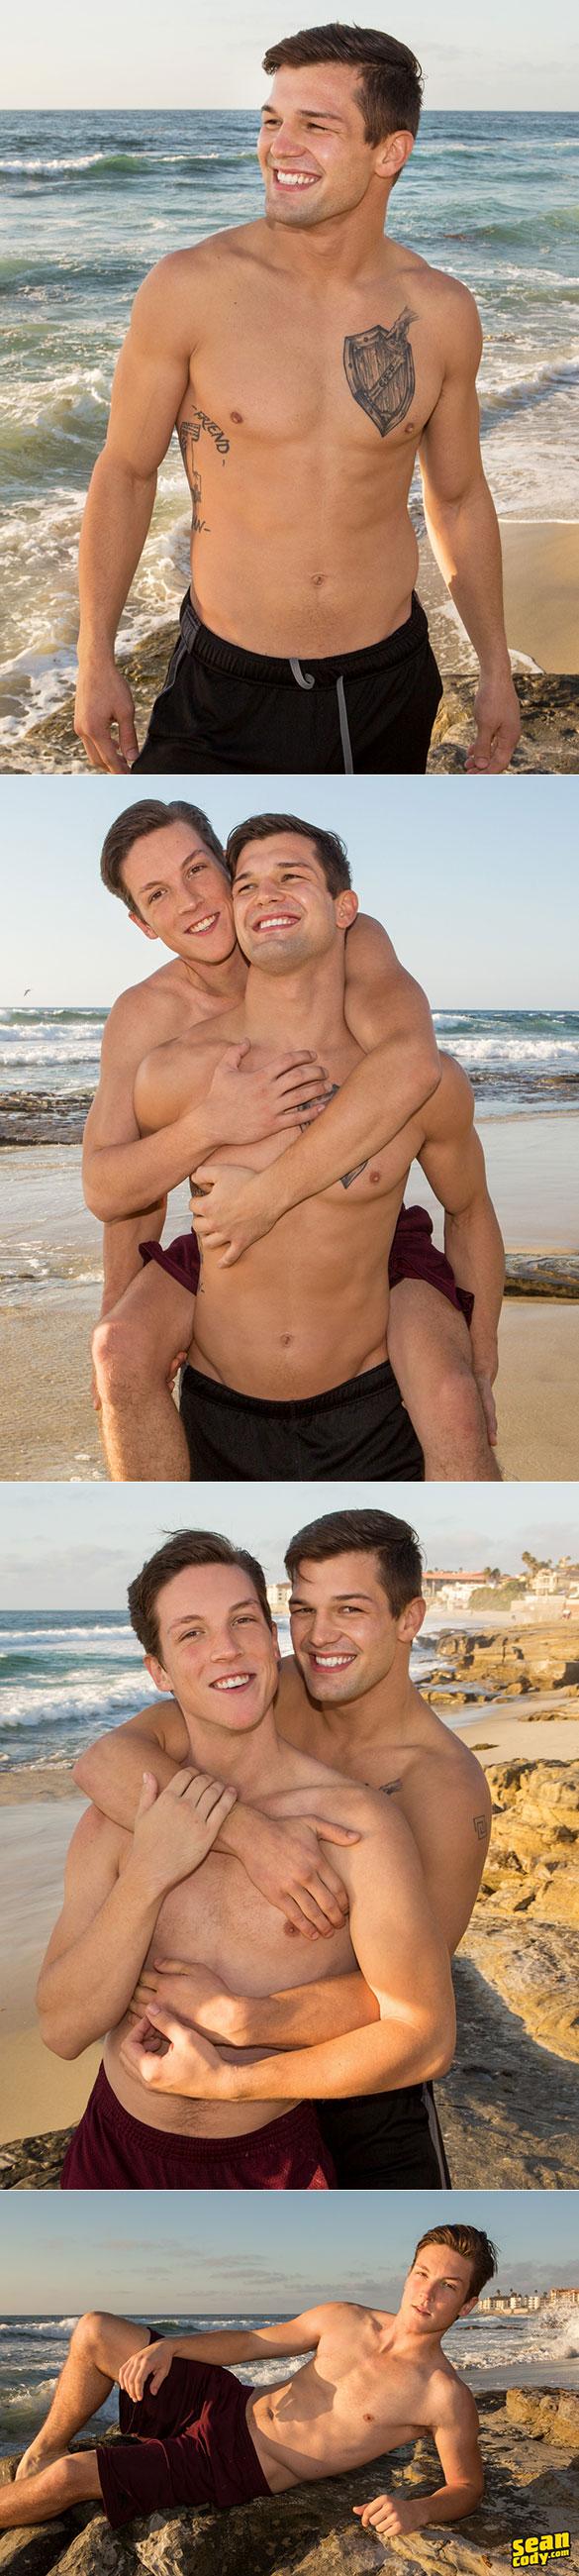 Sean Cody: Brysen pounds Cole bareback